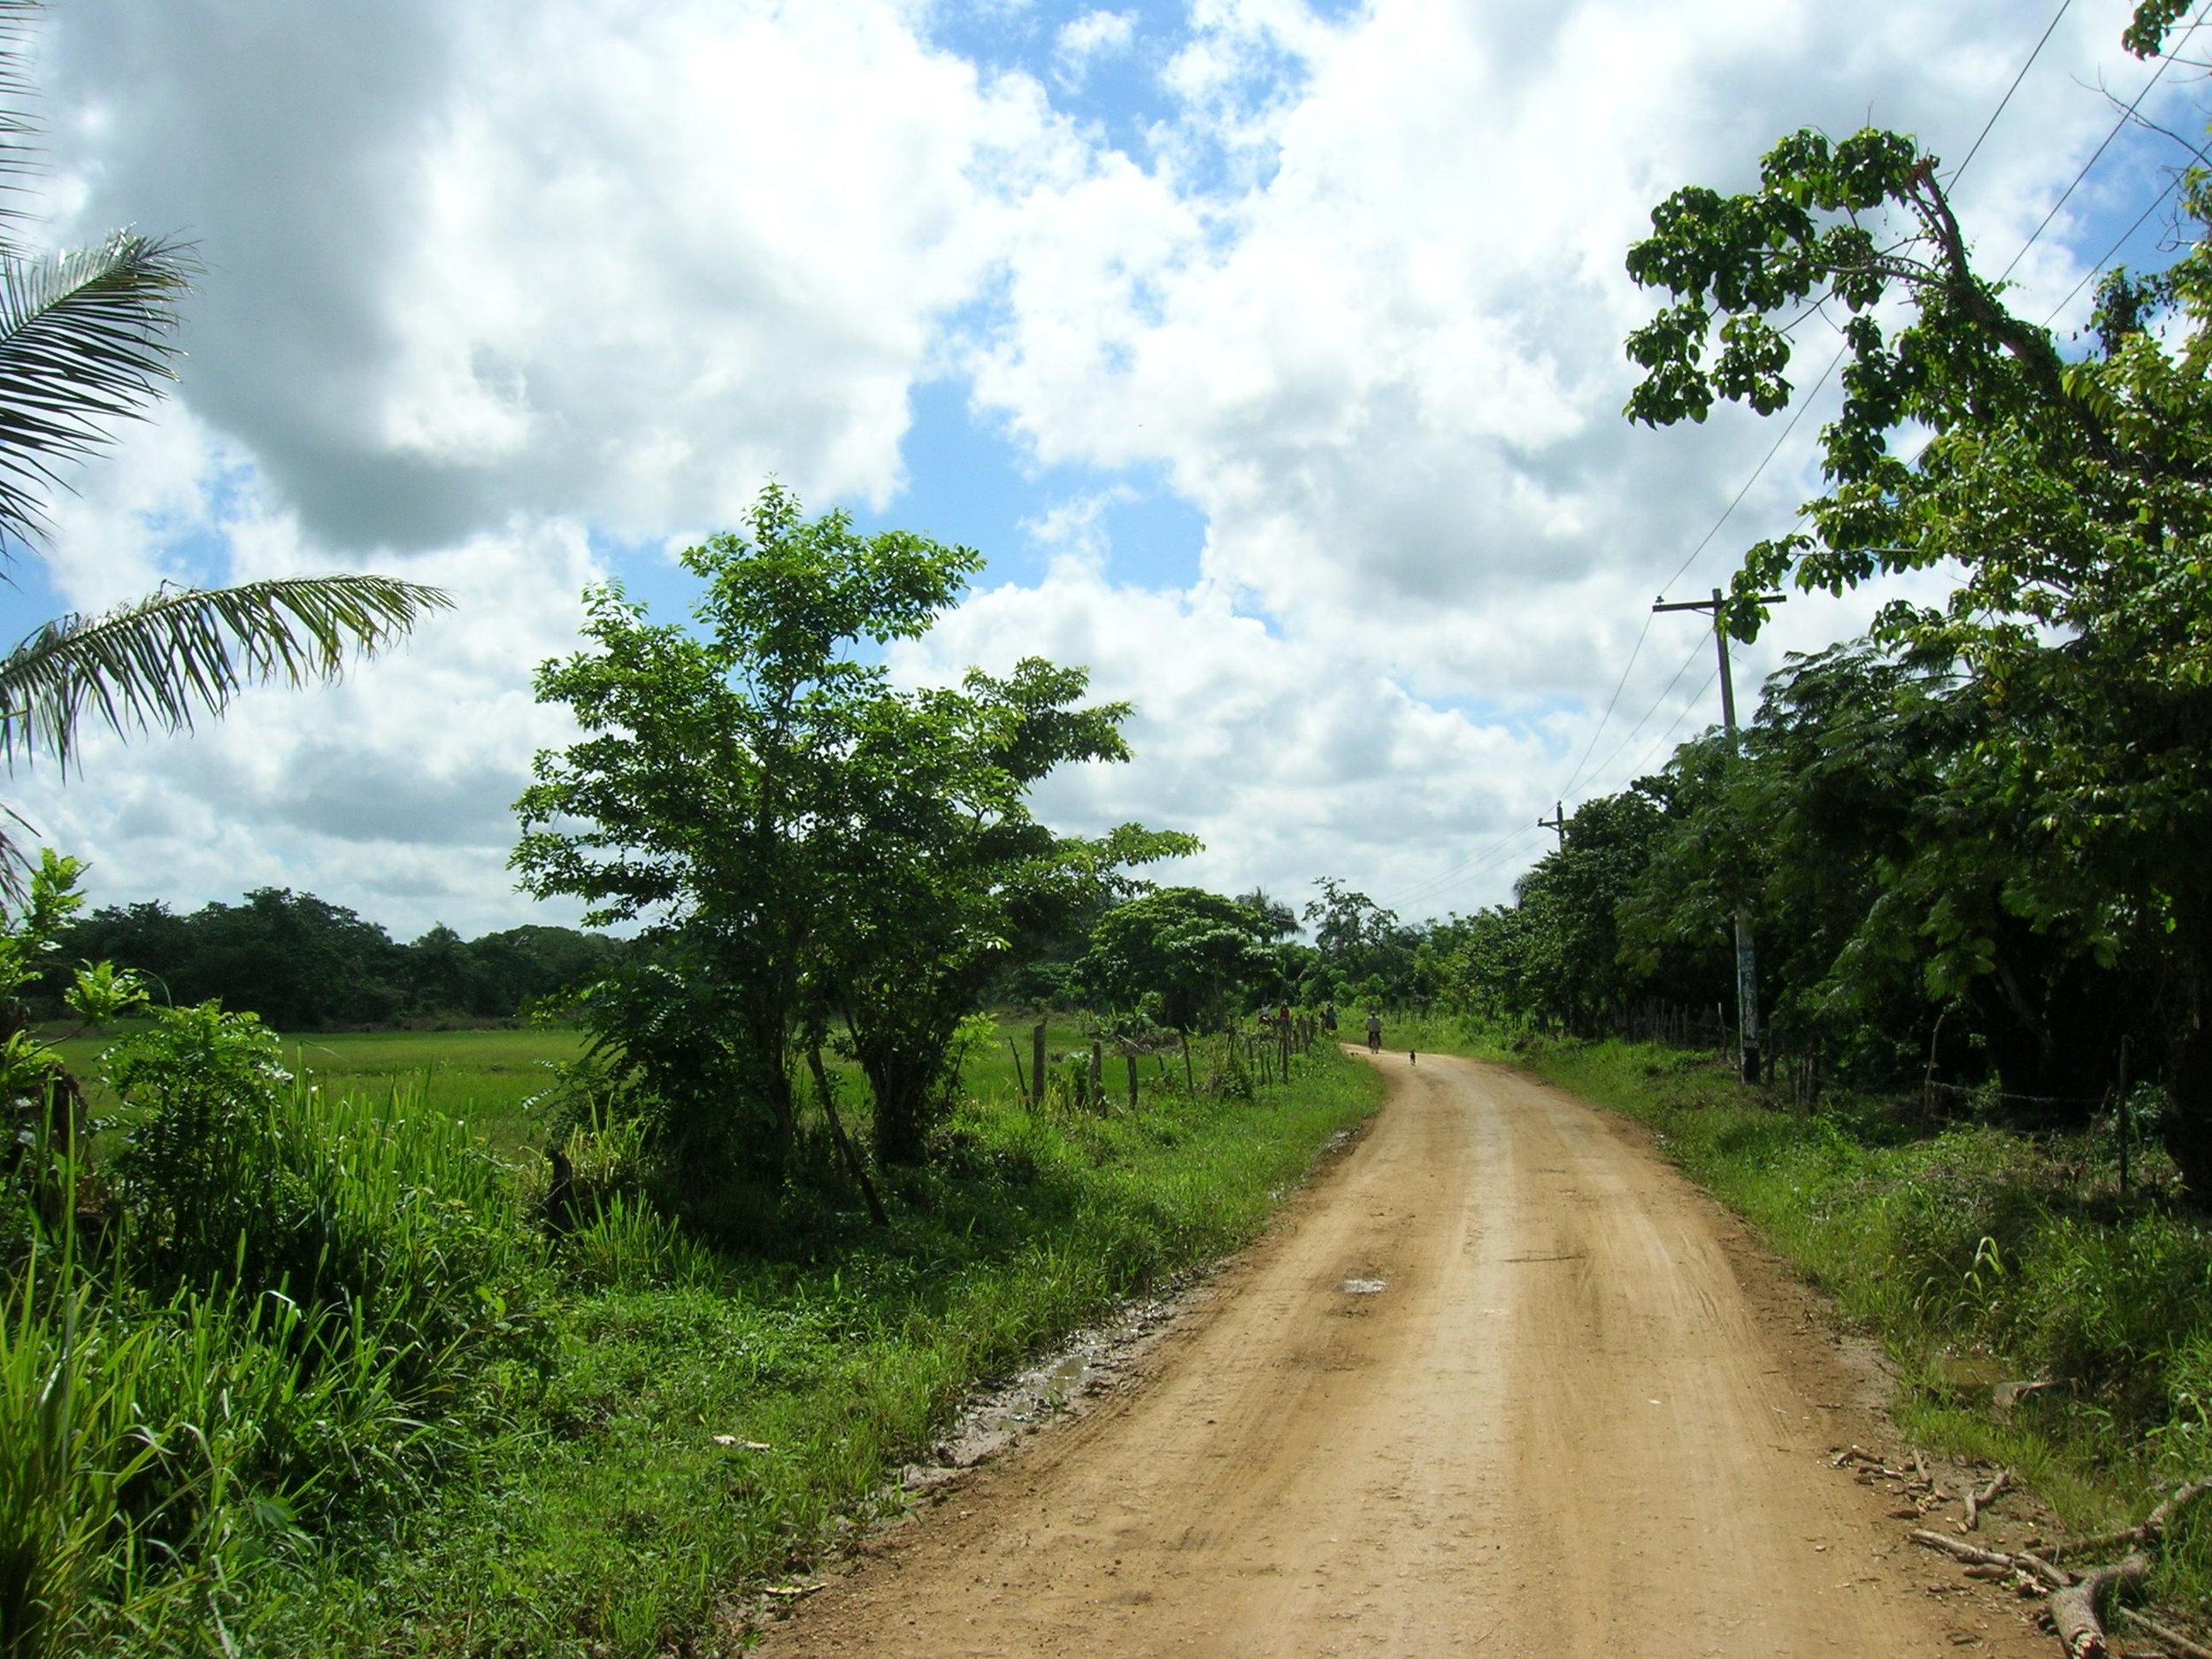 The dirt road in Cruz Verde